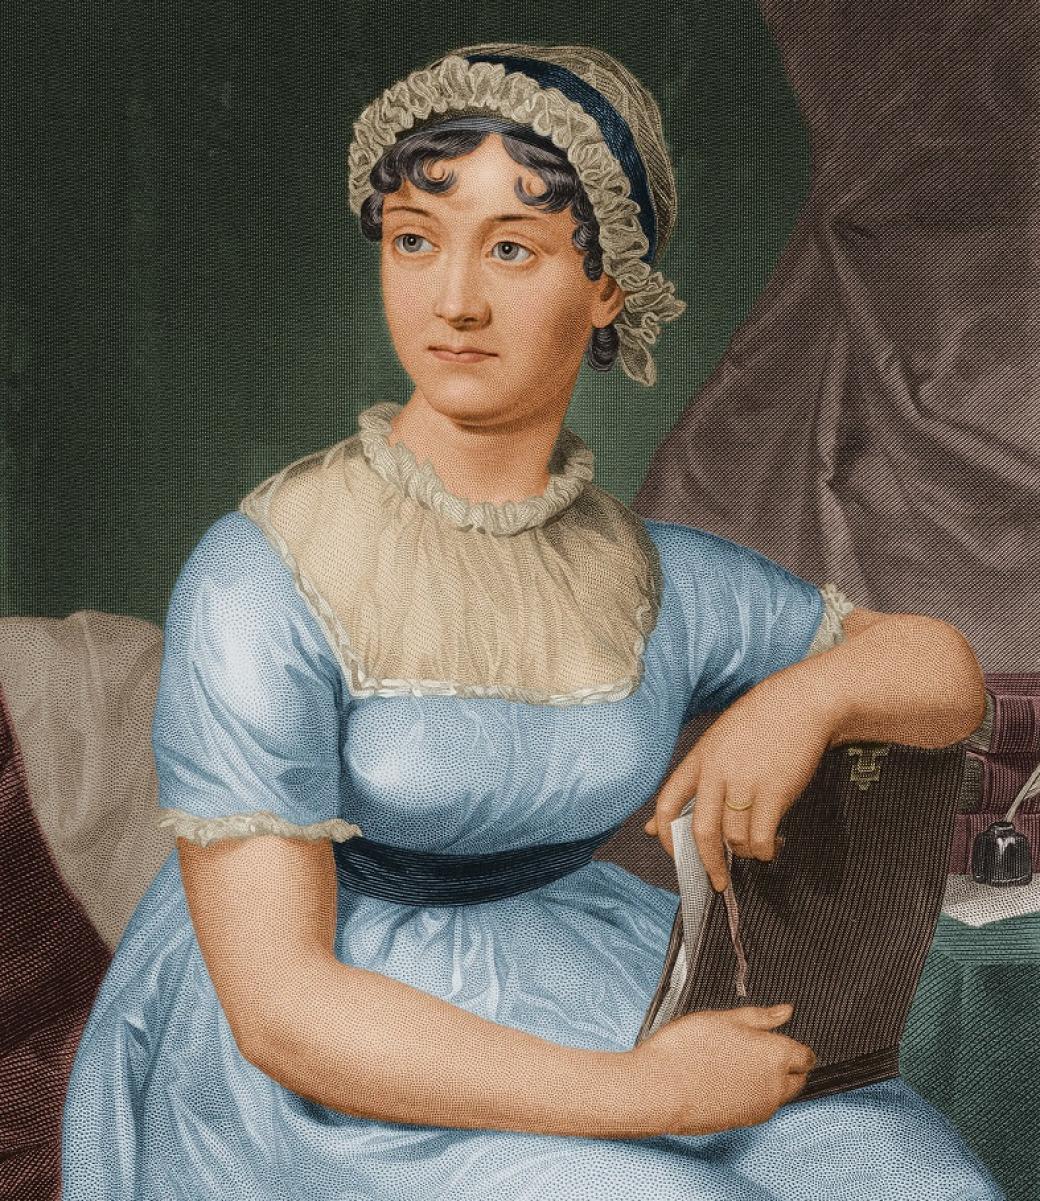 Nonsense & Sensibility: An Improvised Jane Austen